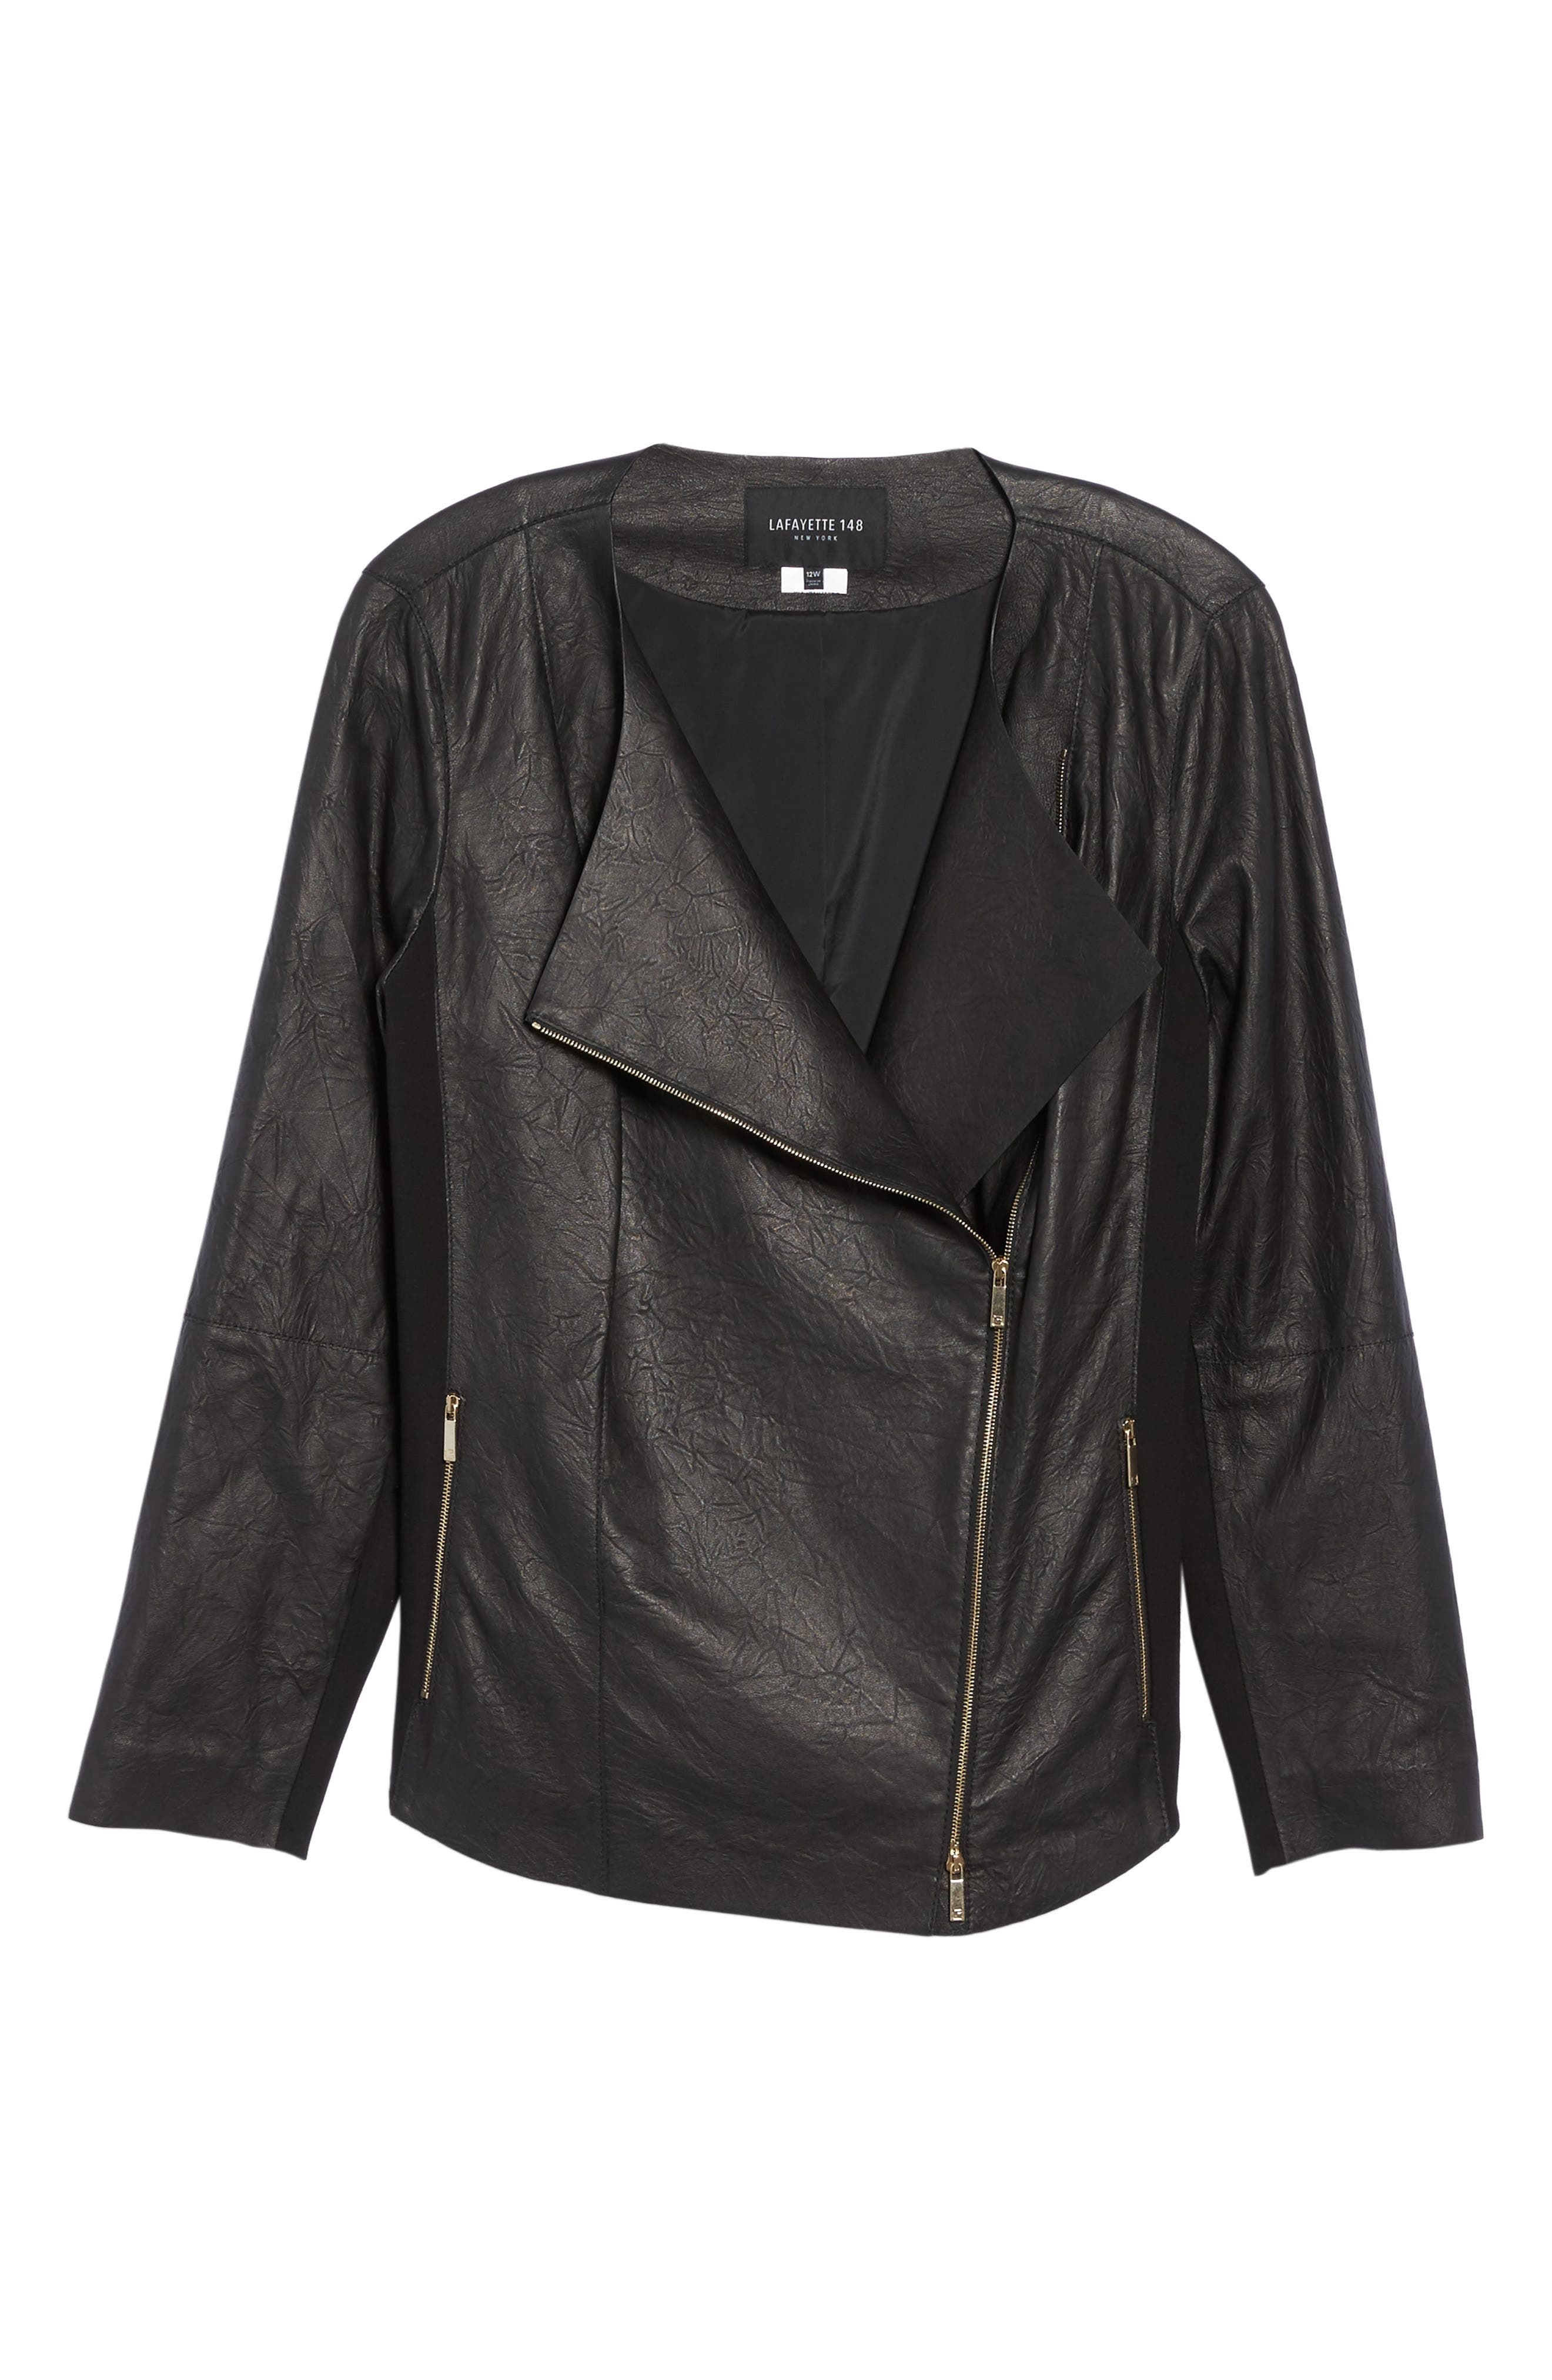 Aimes Leather Jacket,                             Alternate thumbnail 6, color,